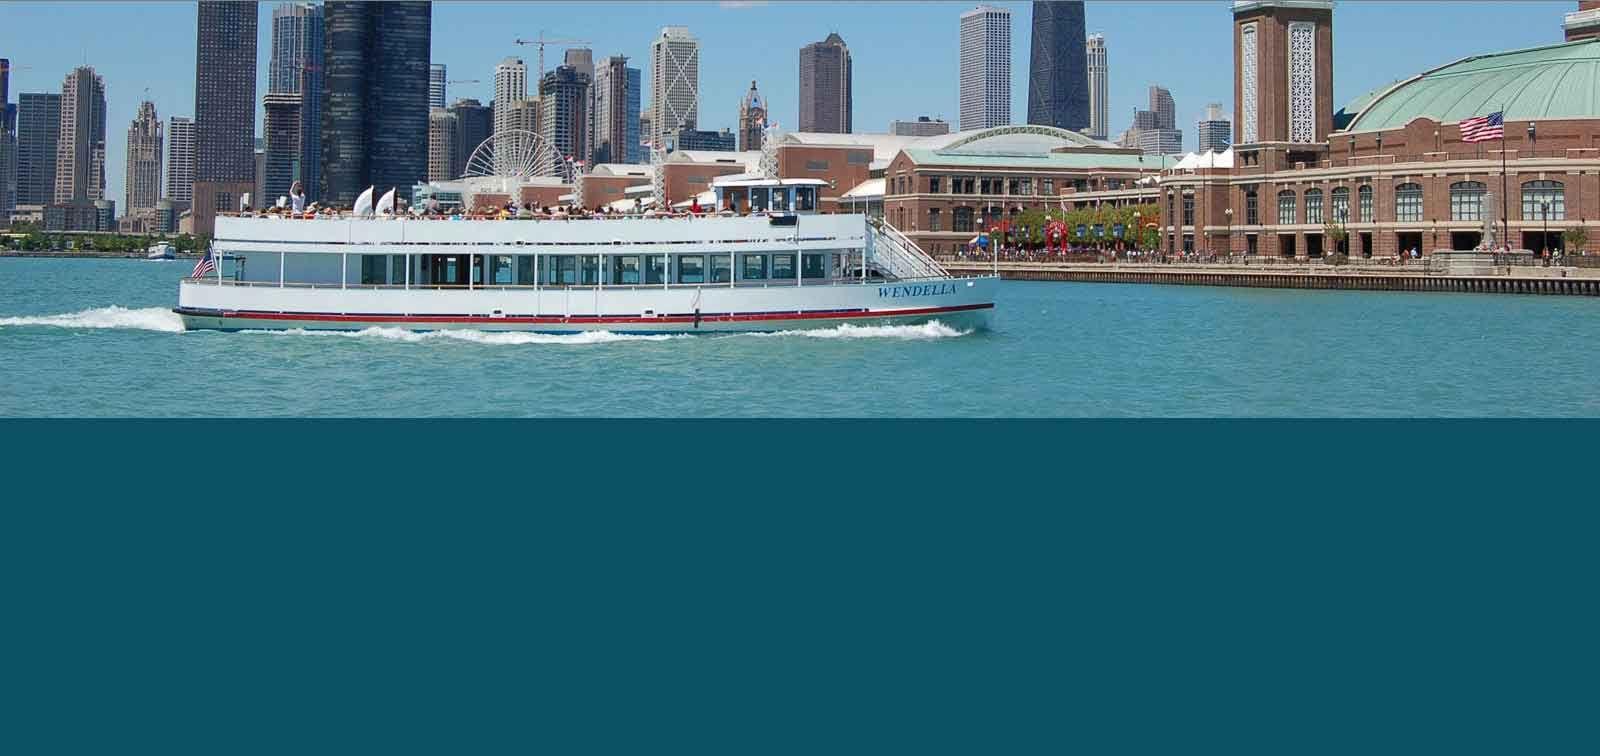 Wendella Sightseeing Boat Tours Chicago's Original